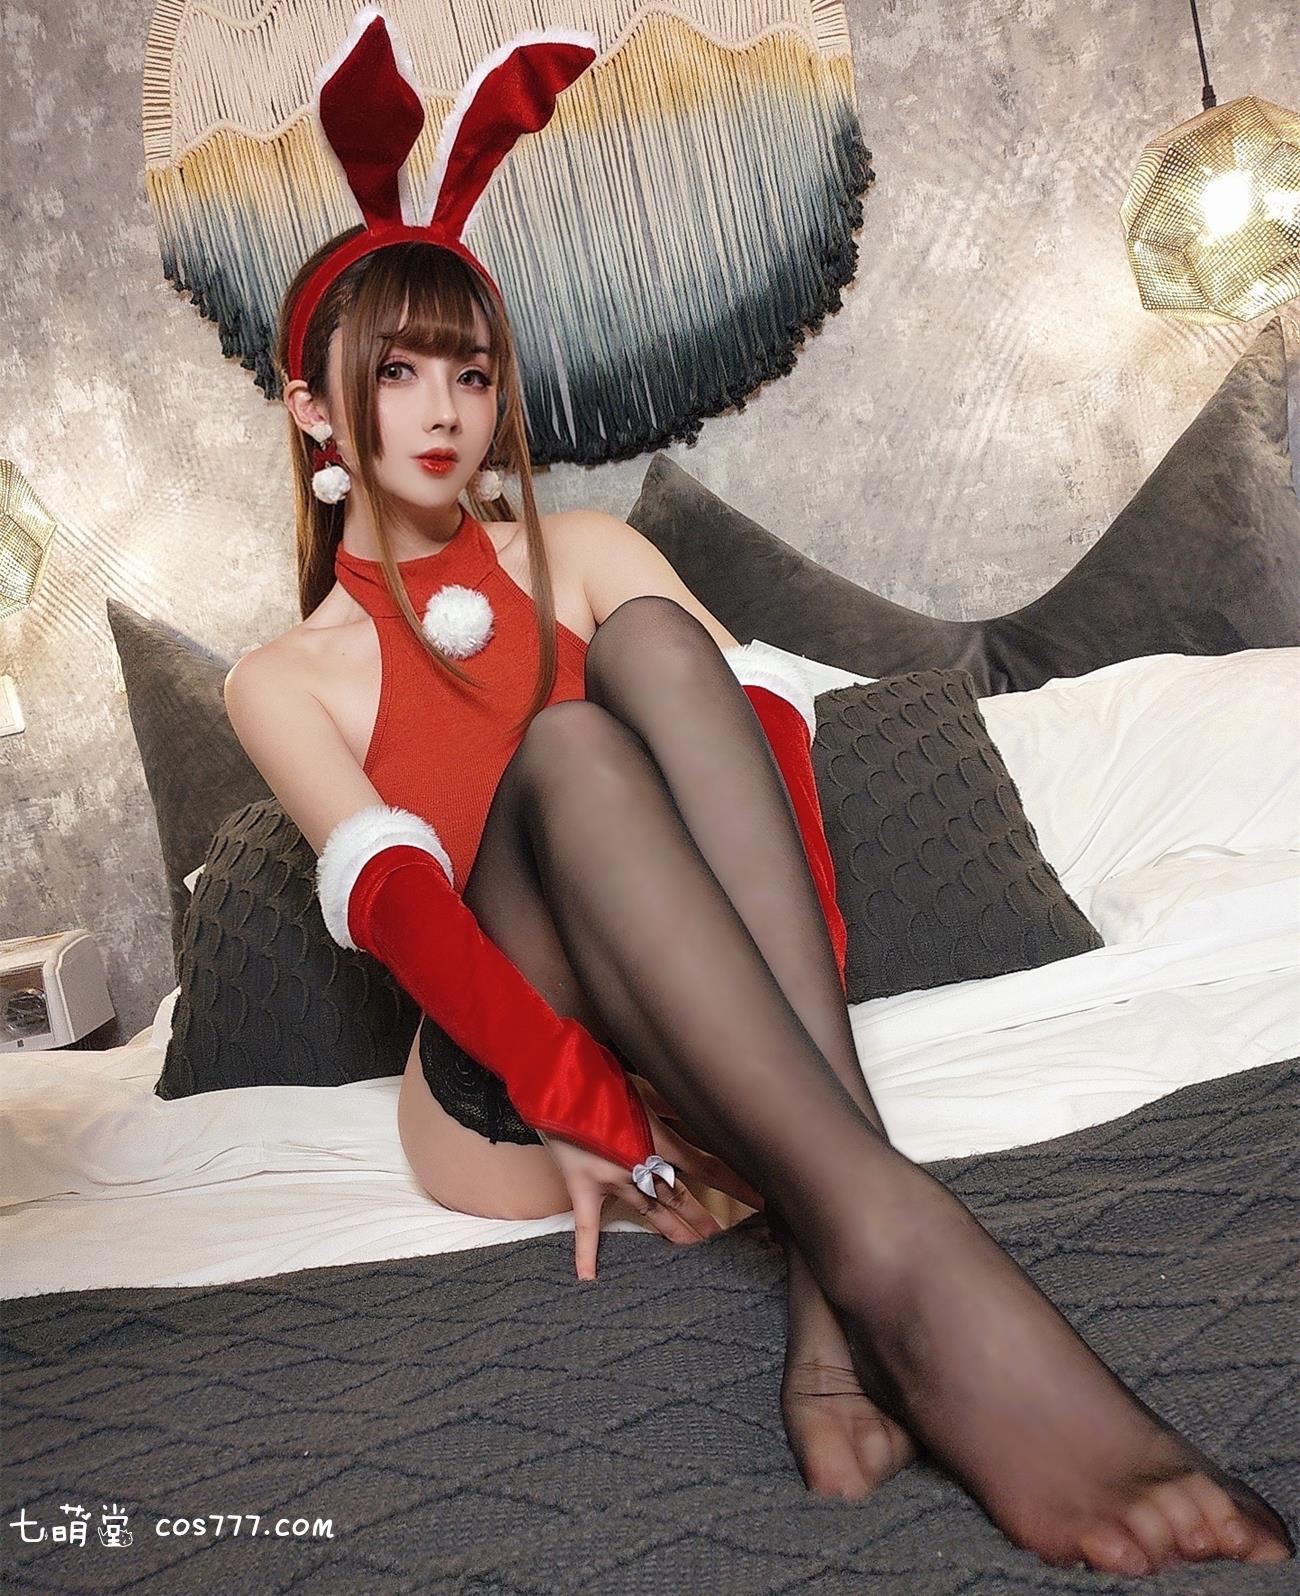 rioko凉凉子(肉扣热热子)最全cosplay图包合集 COS合集